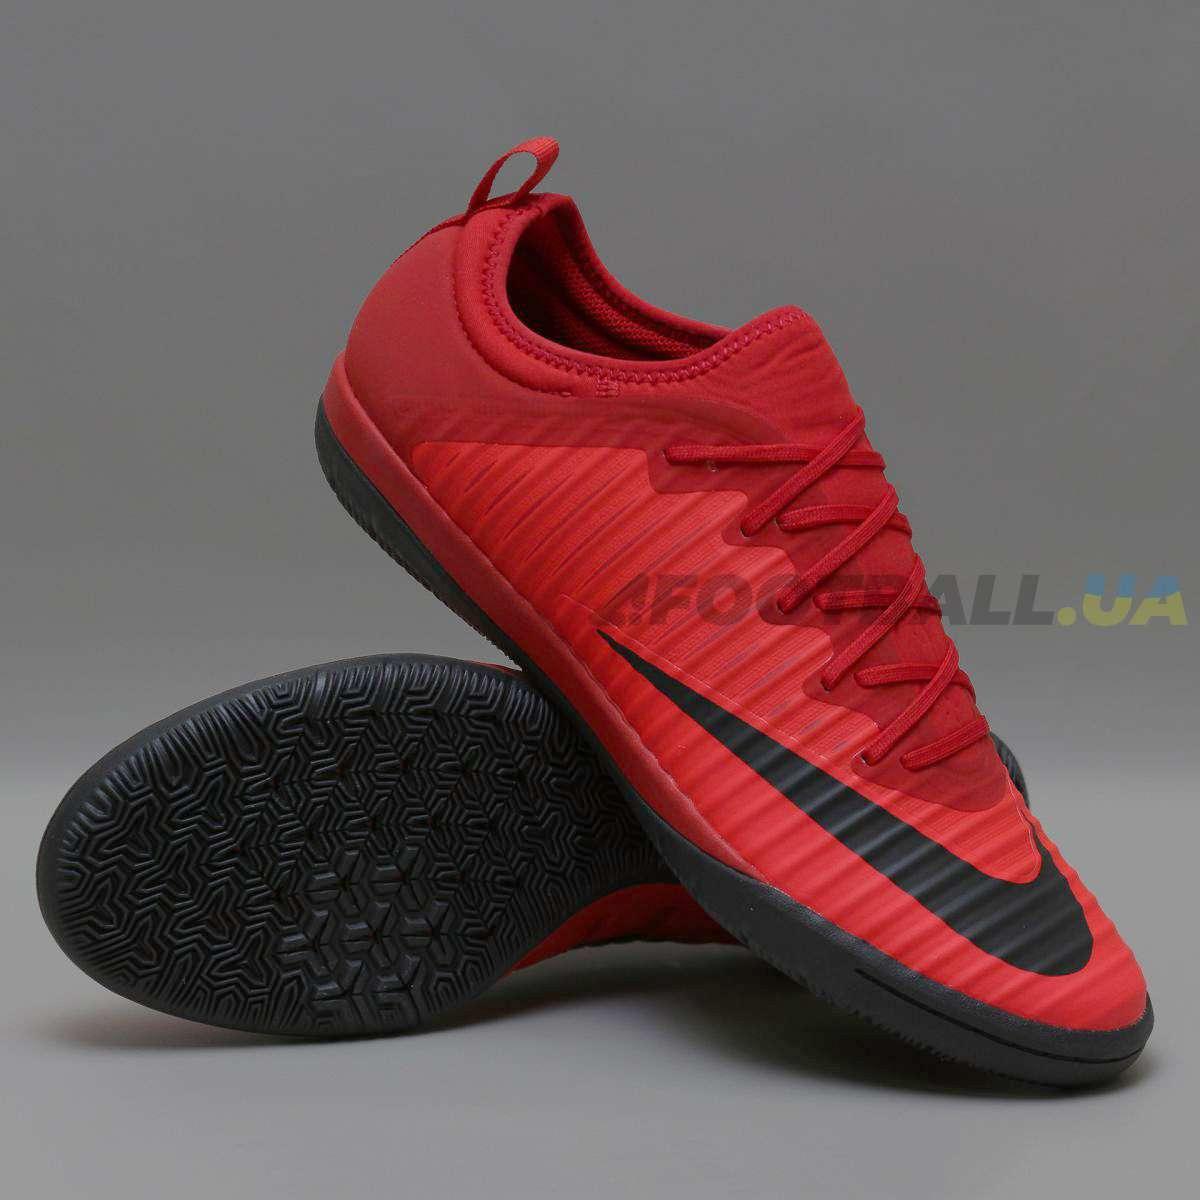 f6efca1a5371 Футзалки Nike MercurialX Finale II IC 831974-616 RED — купить в ...